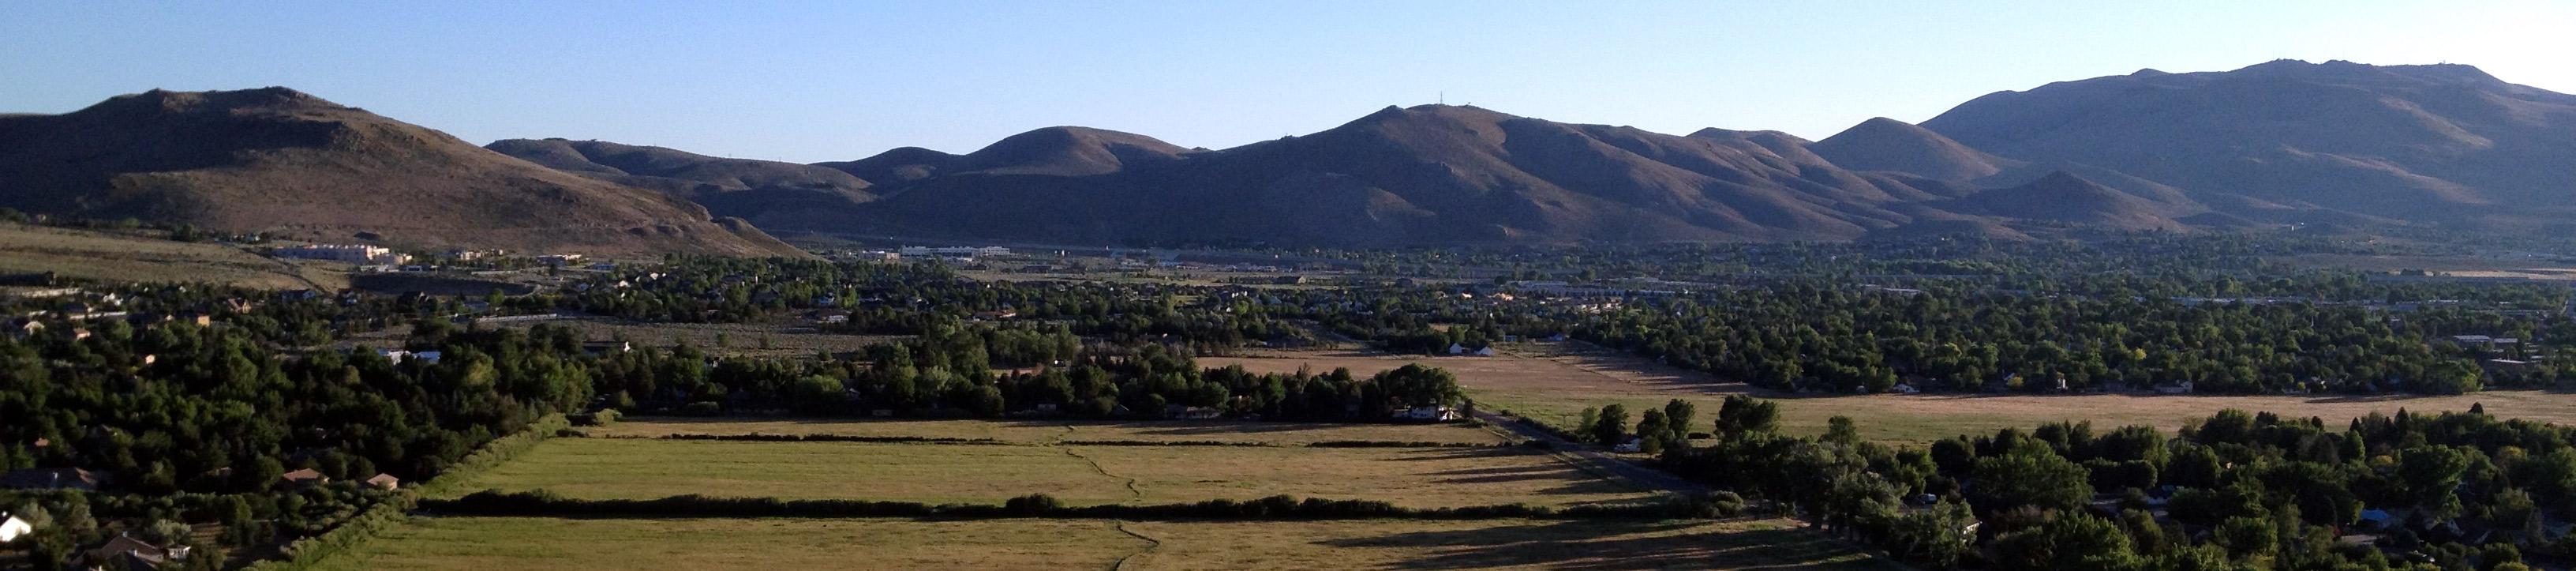 North Carson City Mountains